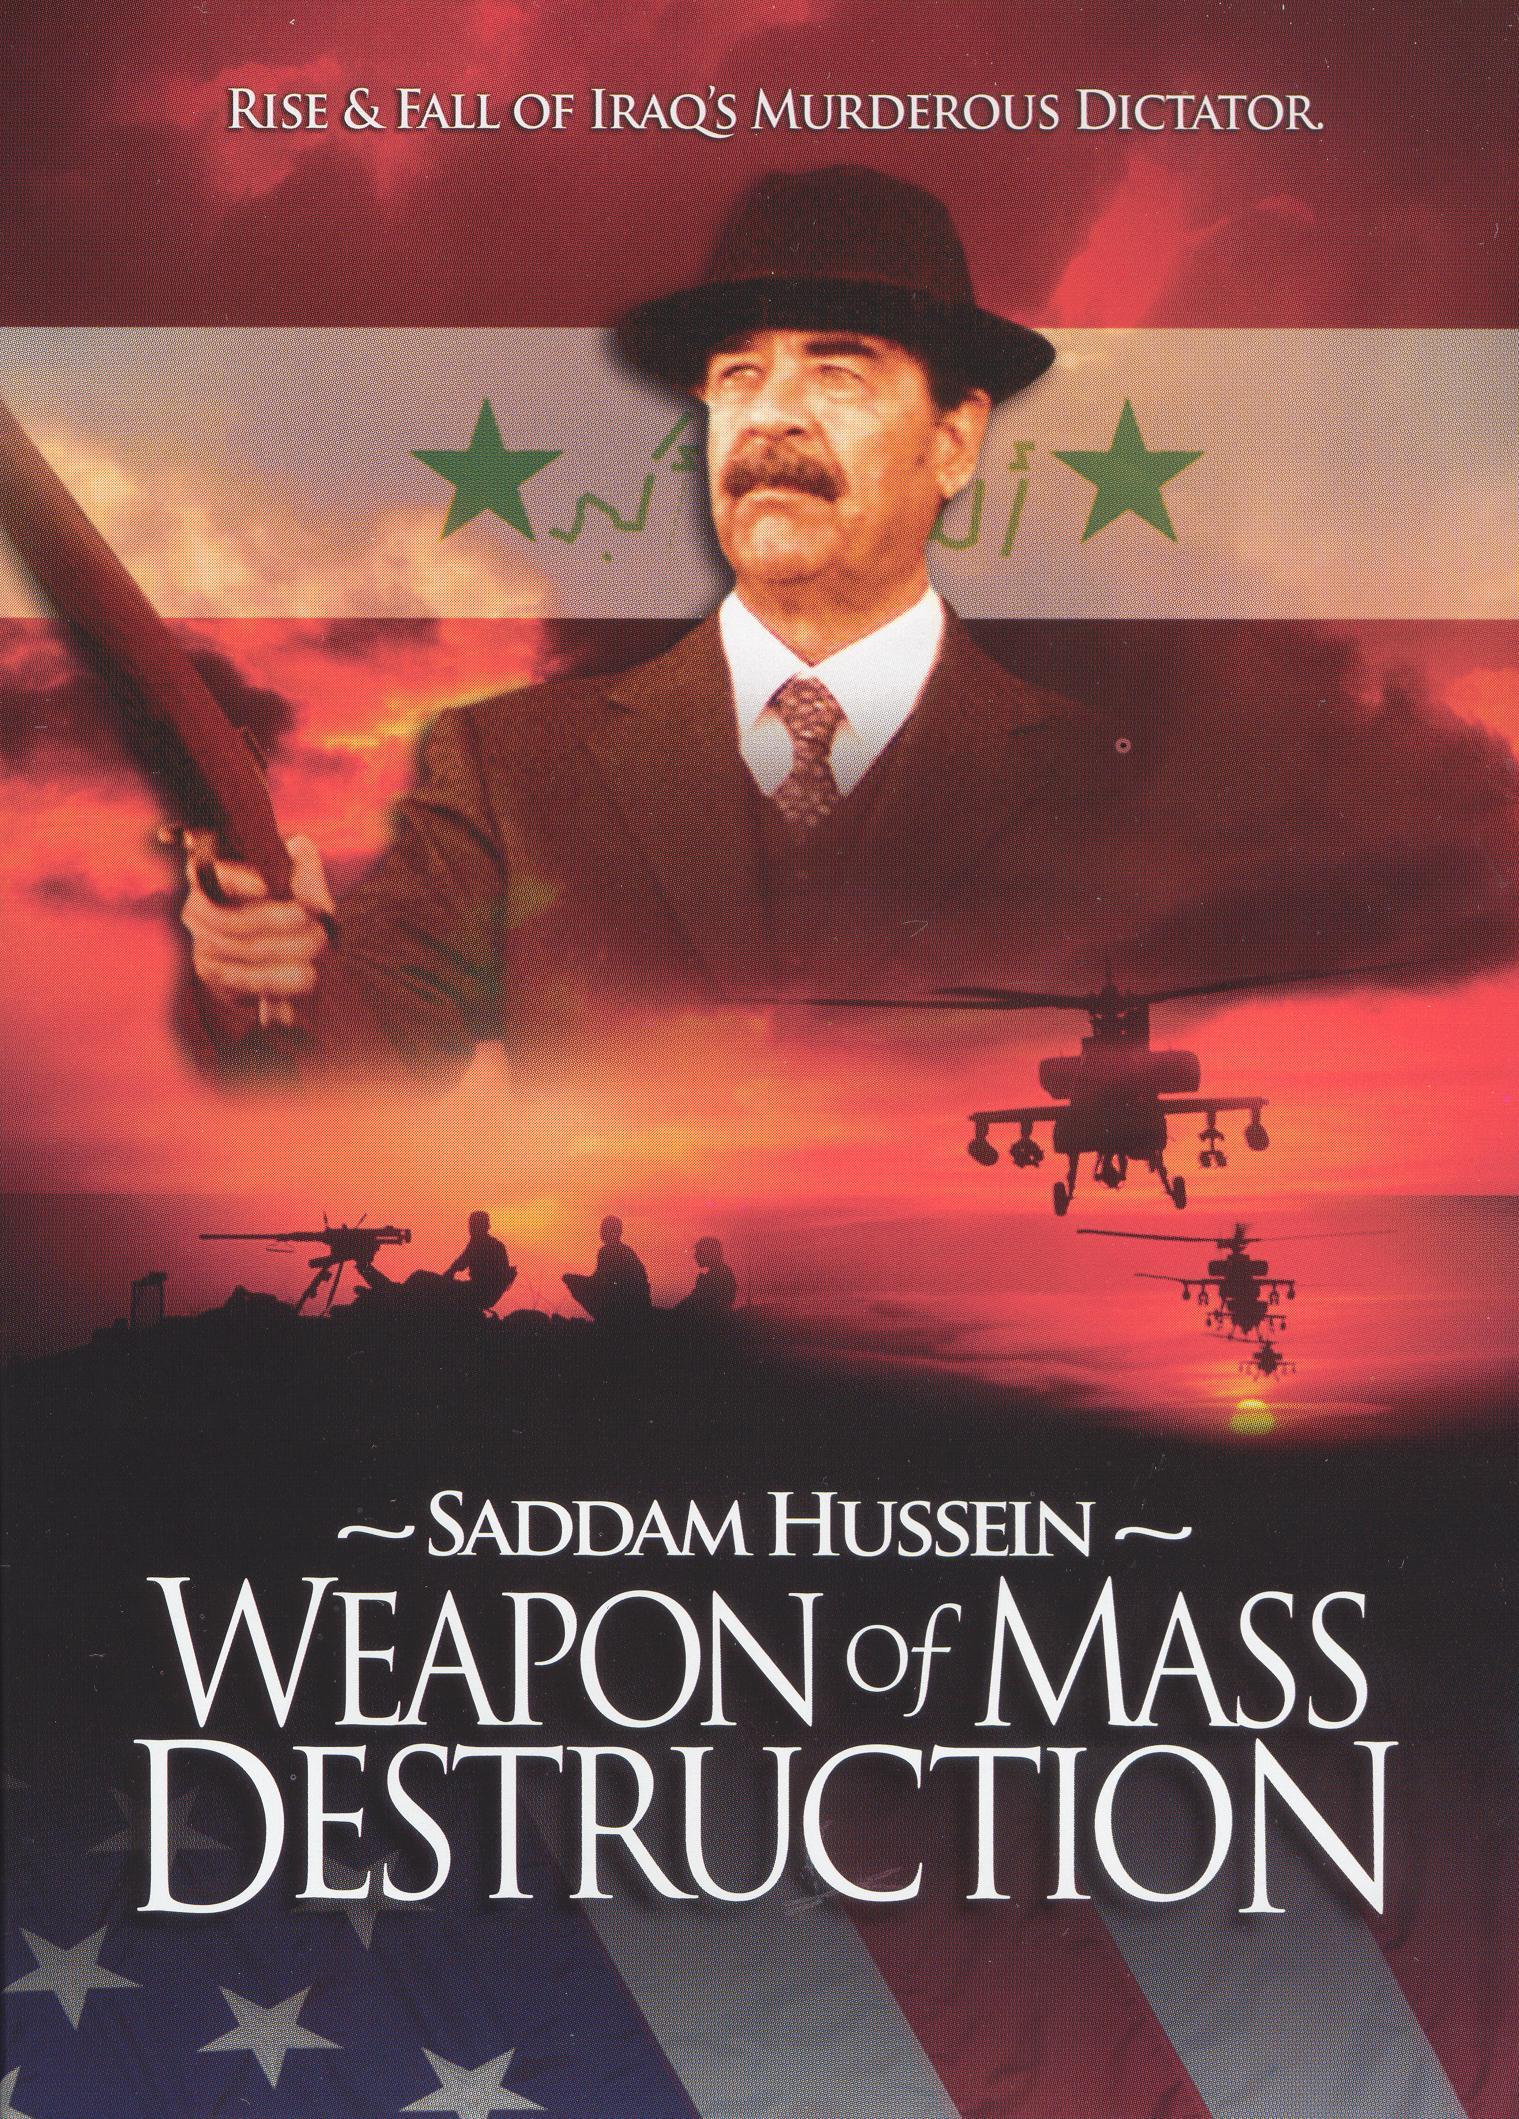 Saddam Hussein: Weapon of Mass Destruction